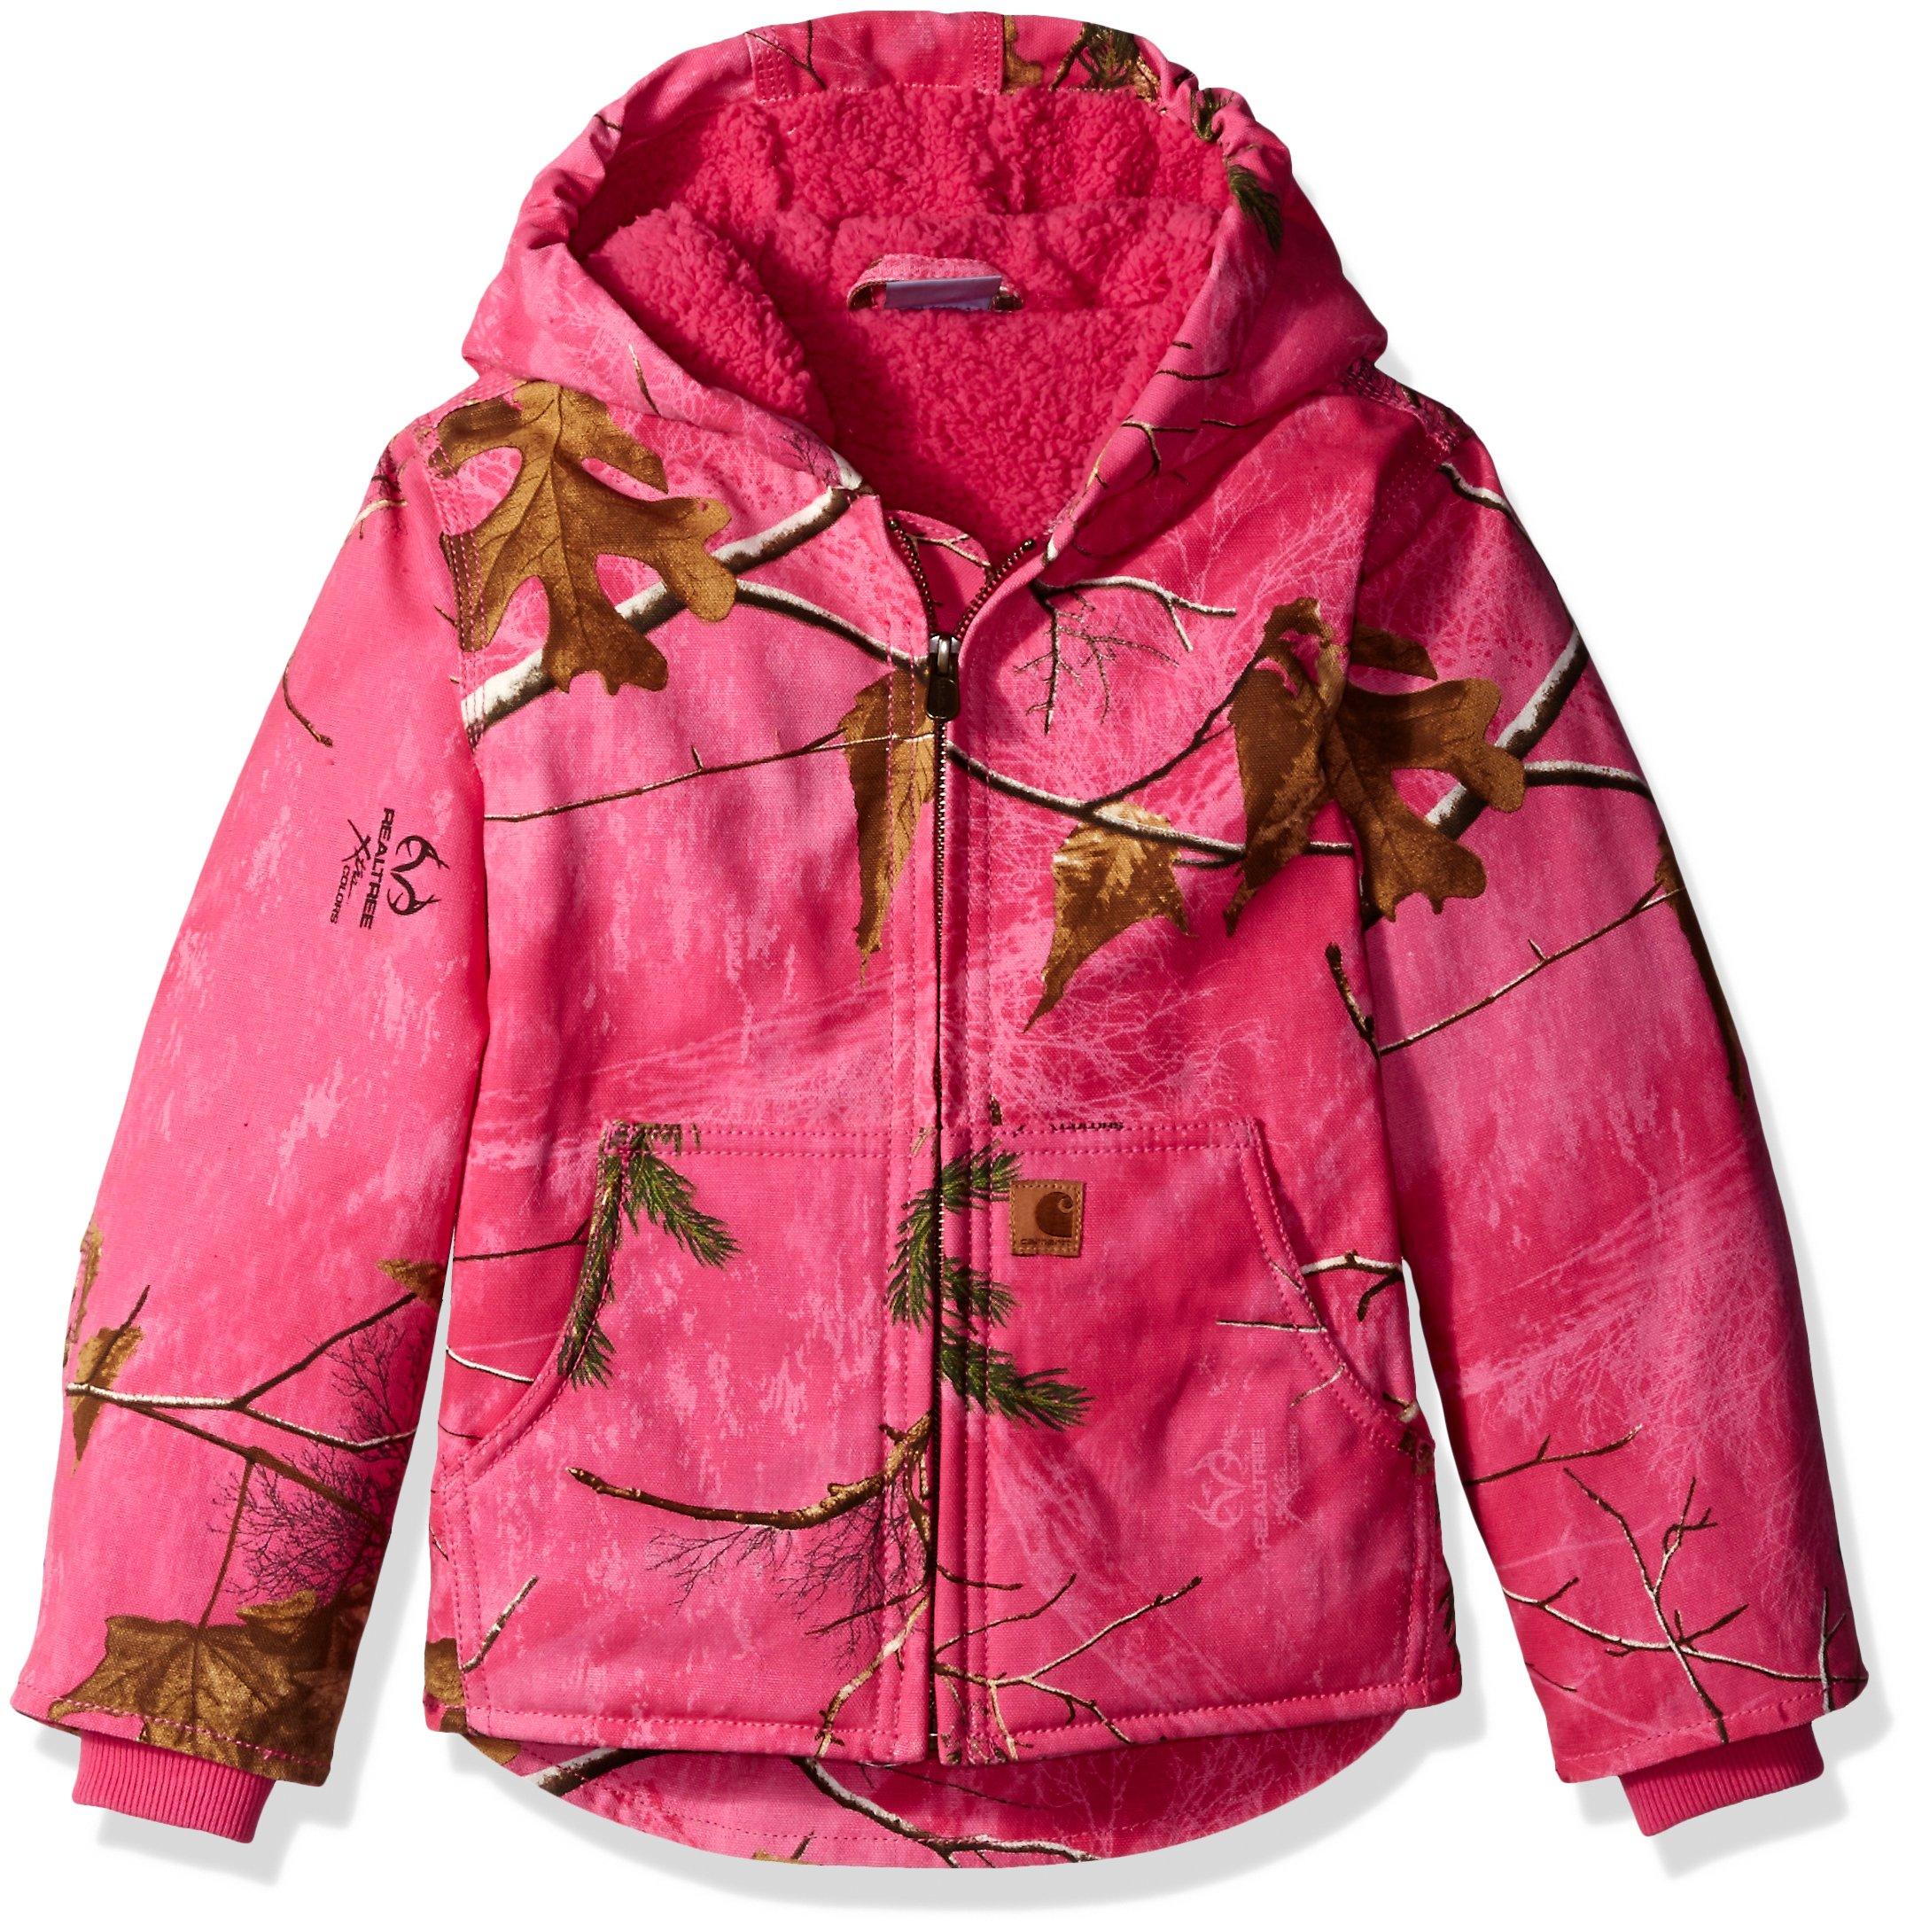 Carhartt Big Girls' Redwood Jacket Sherpa Lined, Realtree Xtra Pink, Large(14)